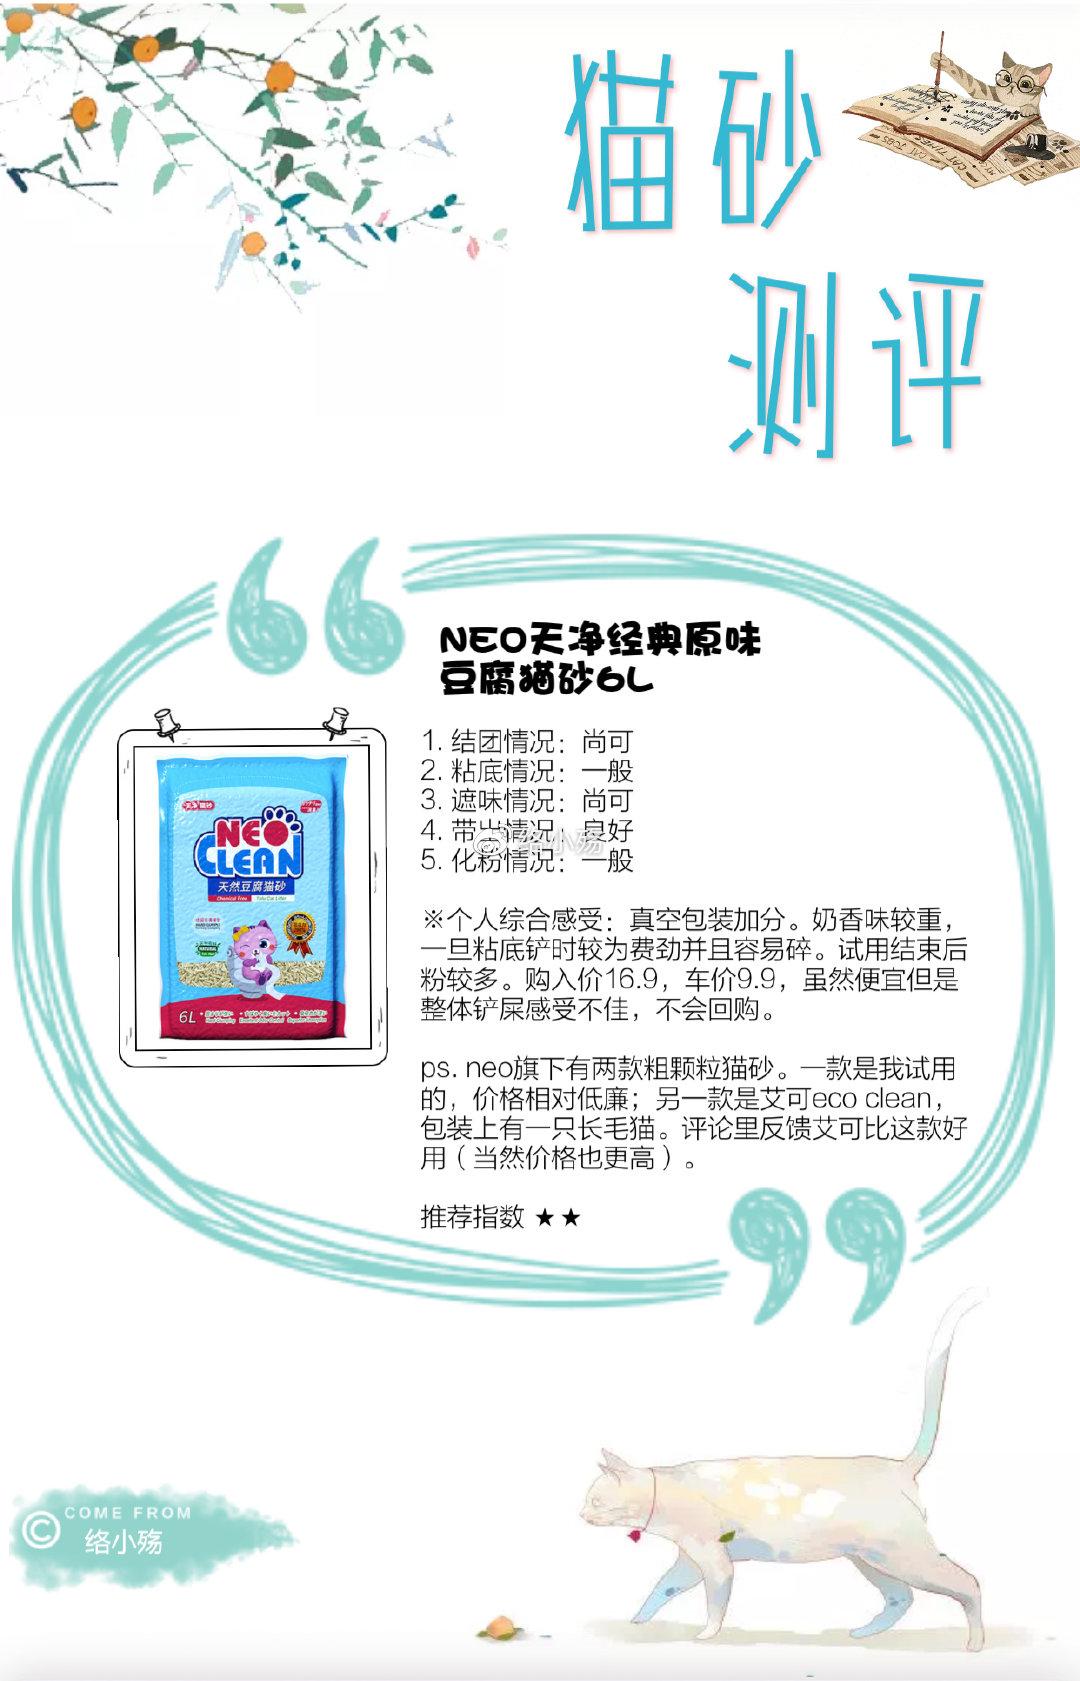 neo天净经典原味豆腐猫砂6L